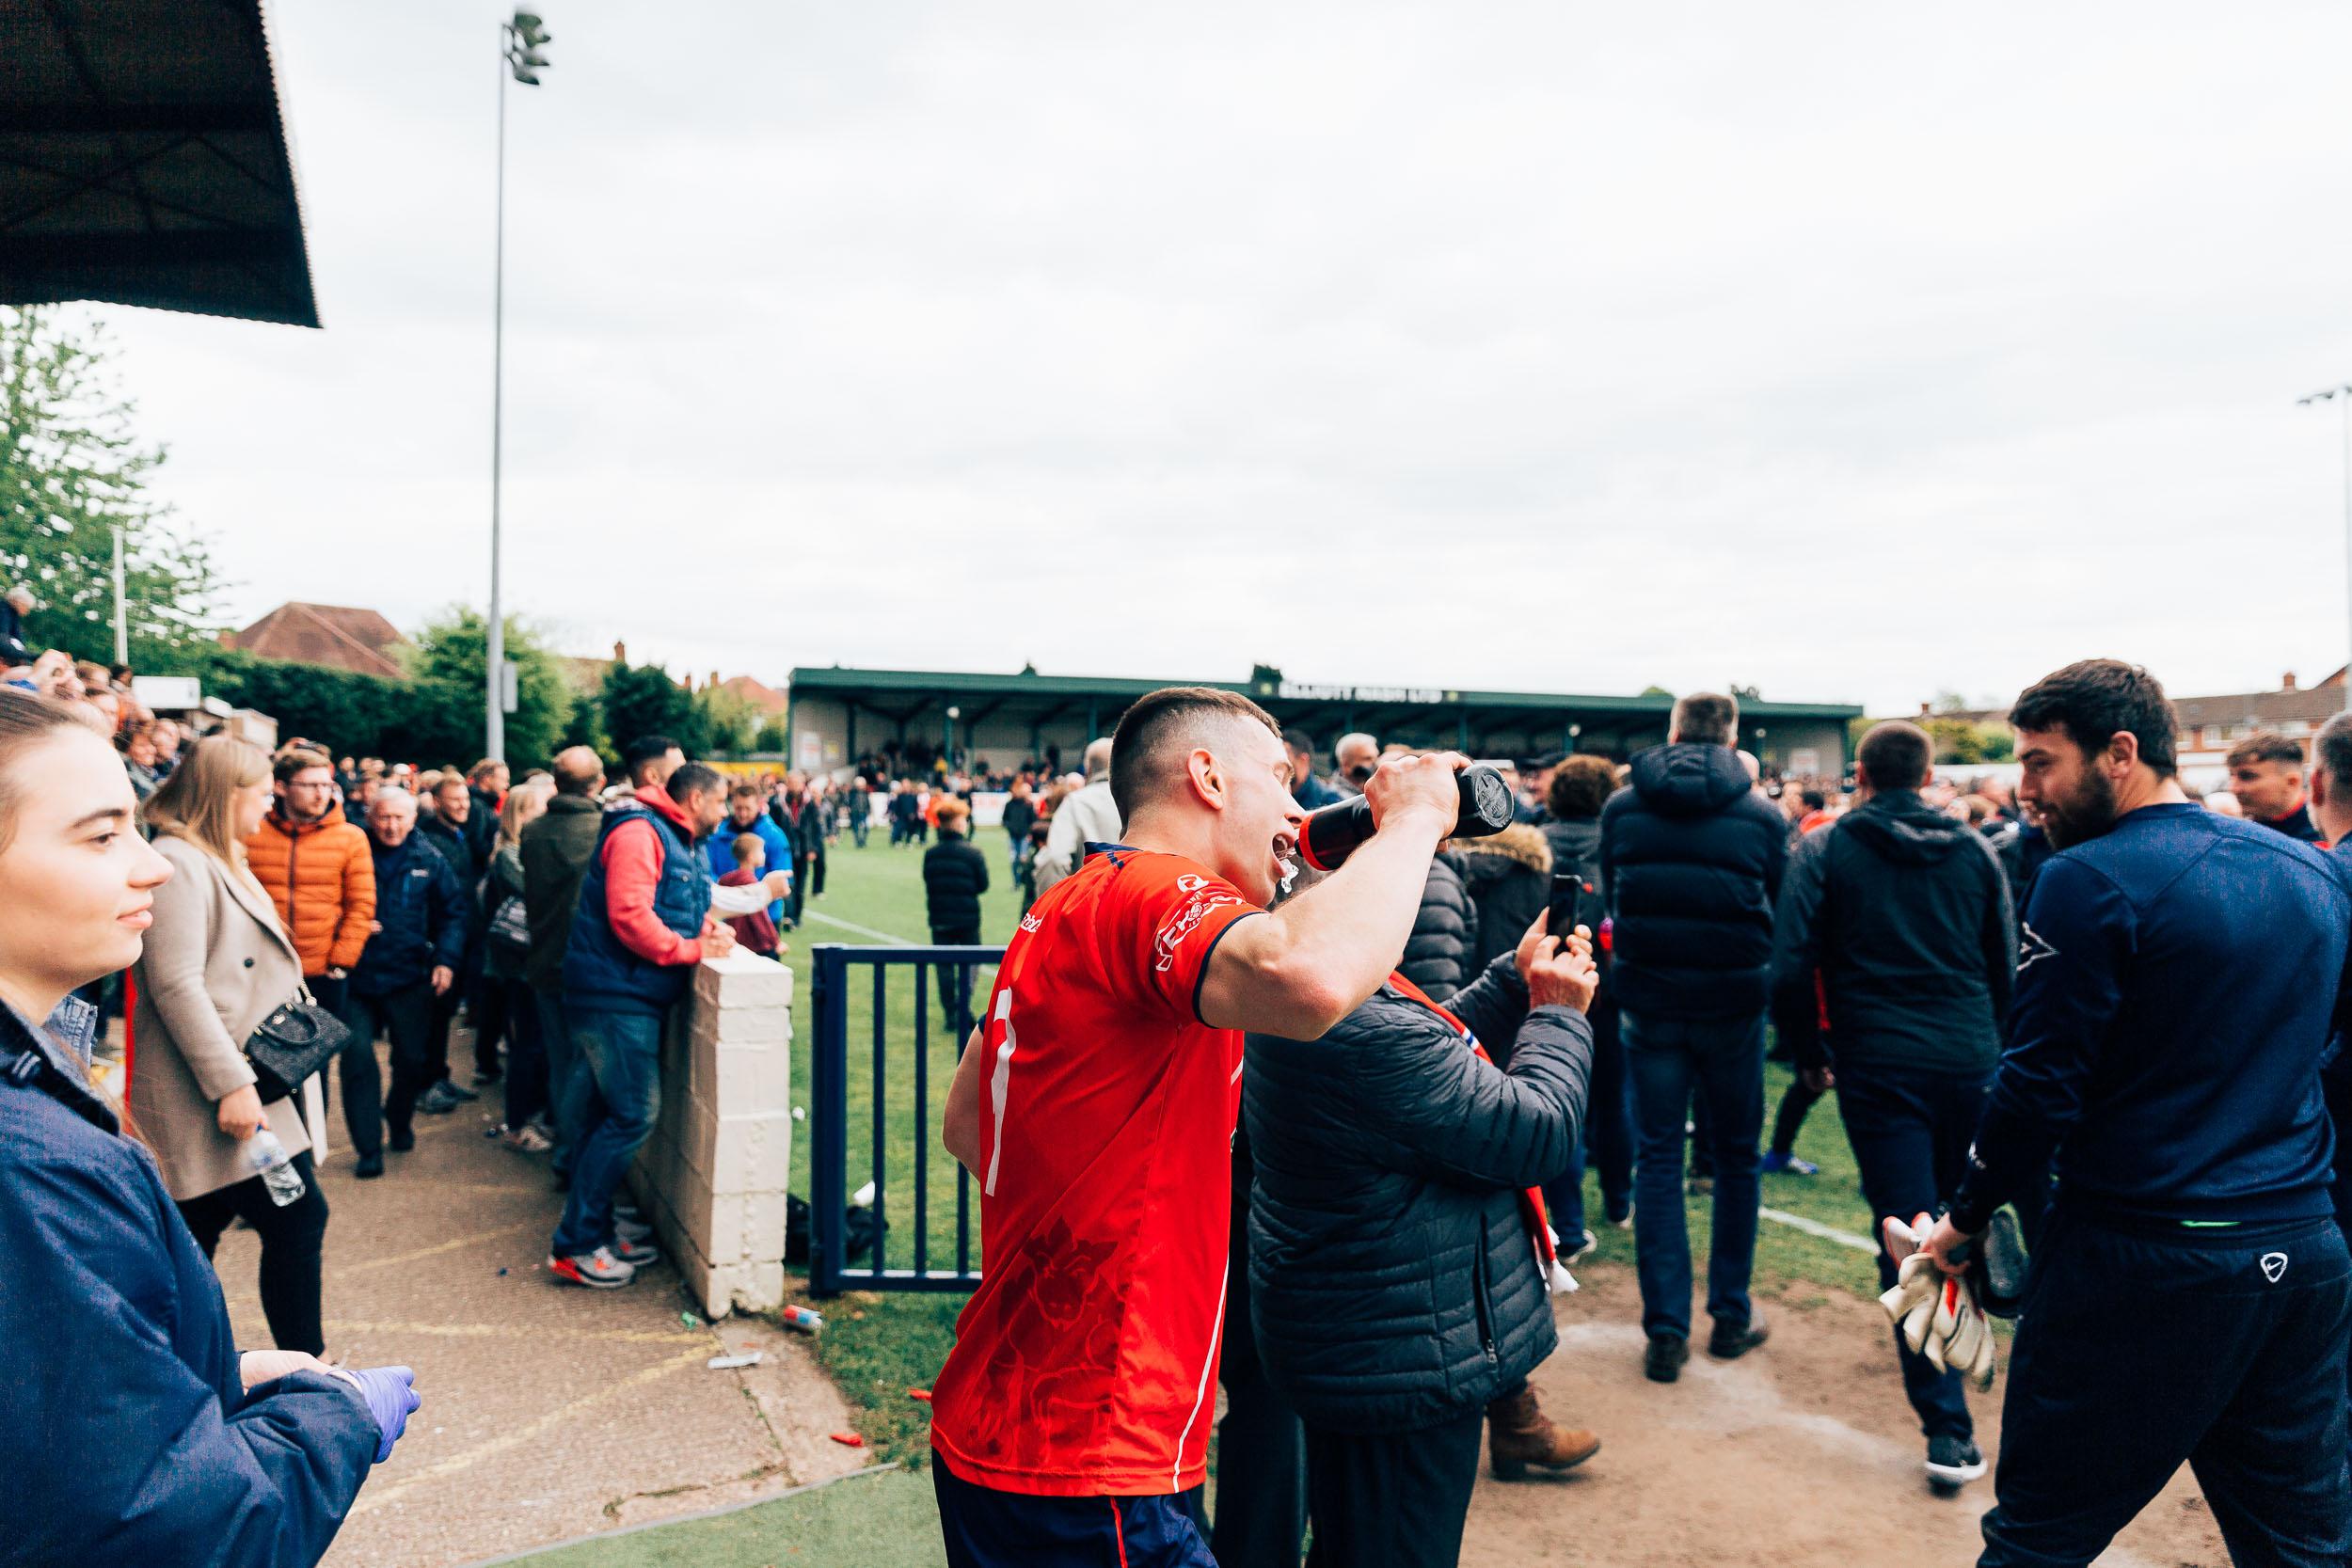 06_05_2019_Bromsgrove_Sporting_Corby-190.jpg